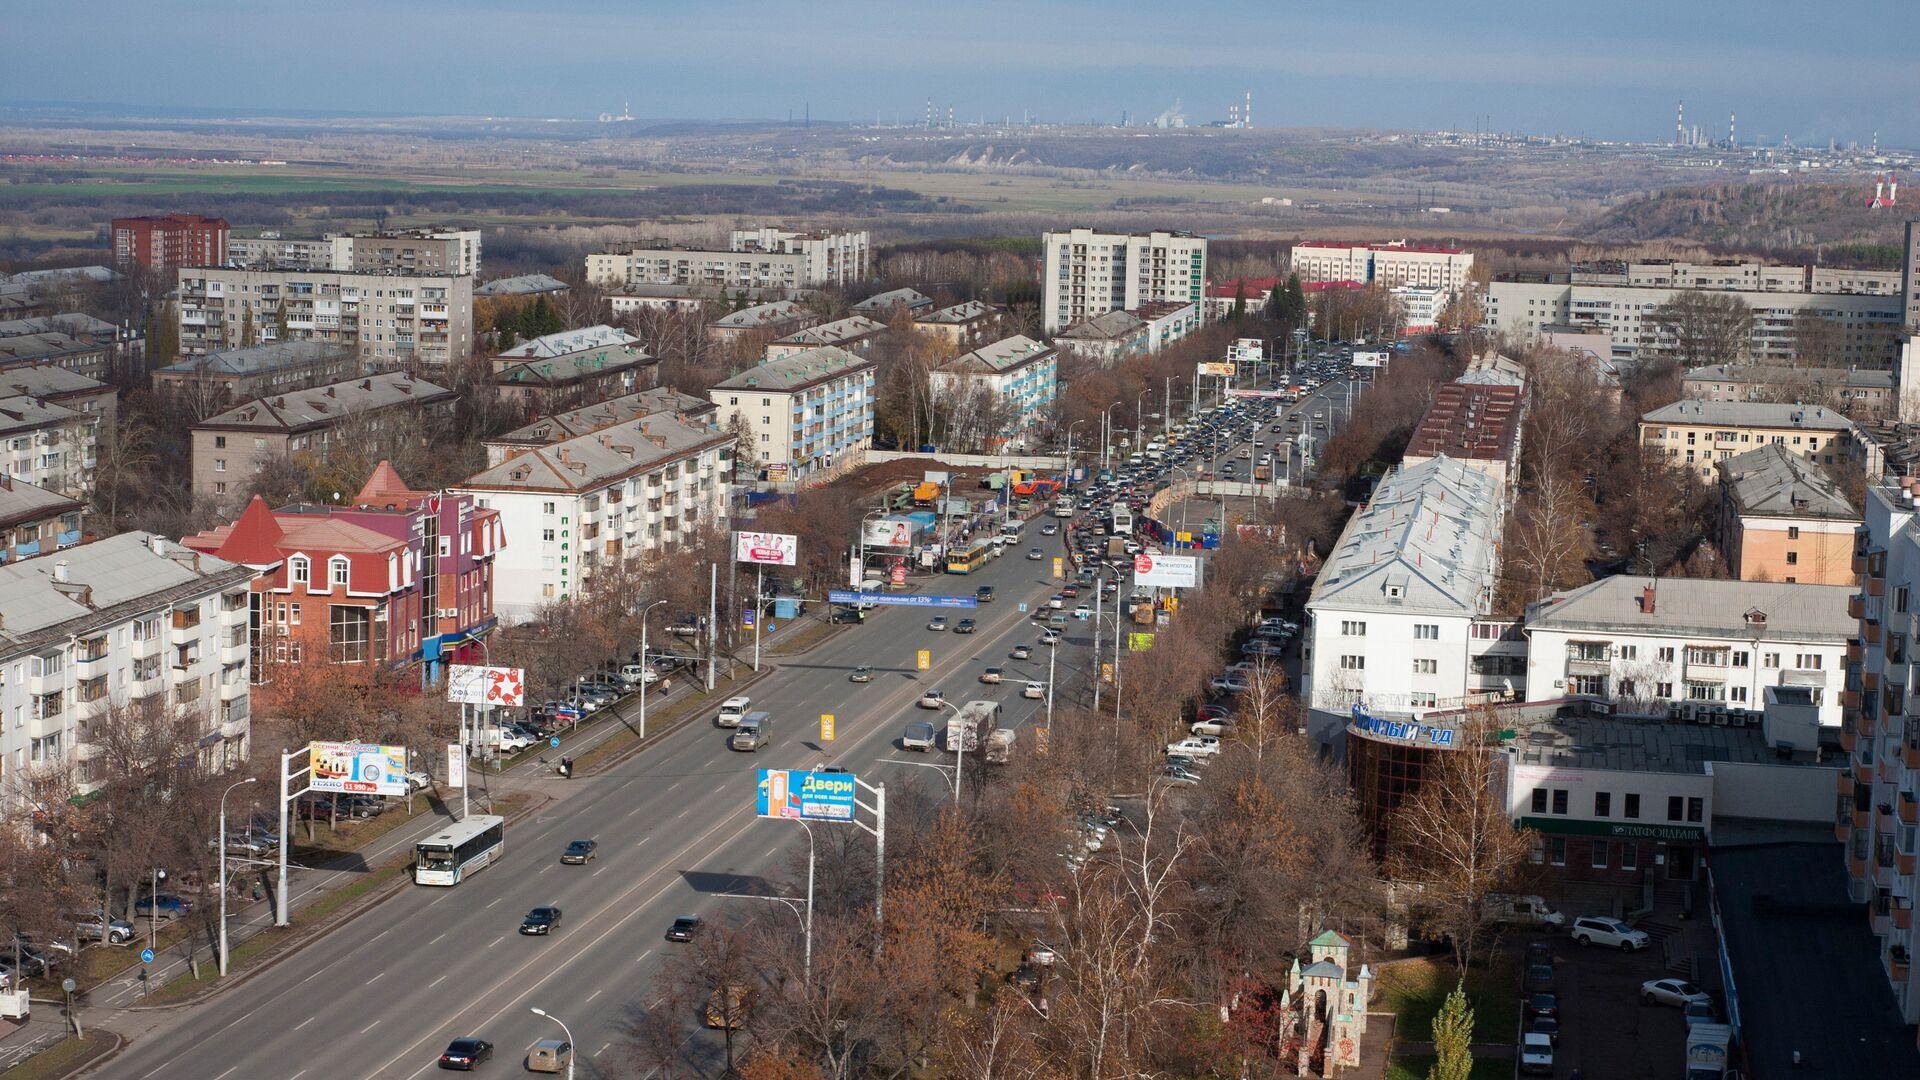 Вид на проспект Октября в Уфе. - РИА Новости, 1920, 03.11.2020